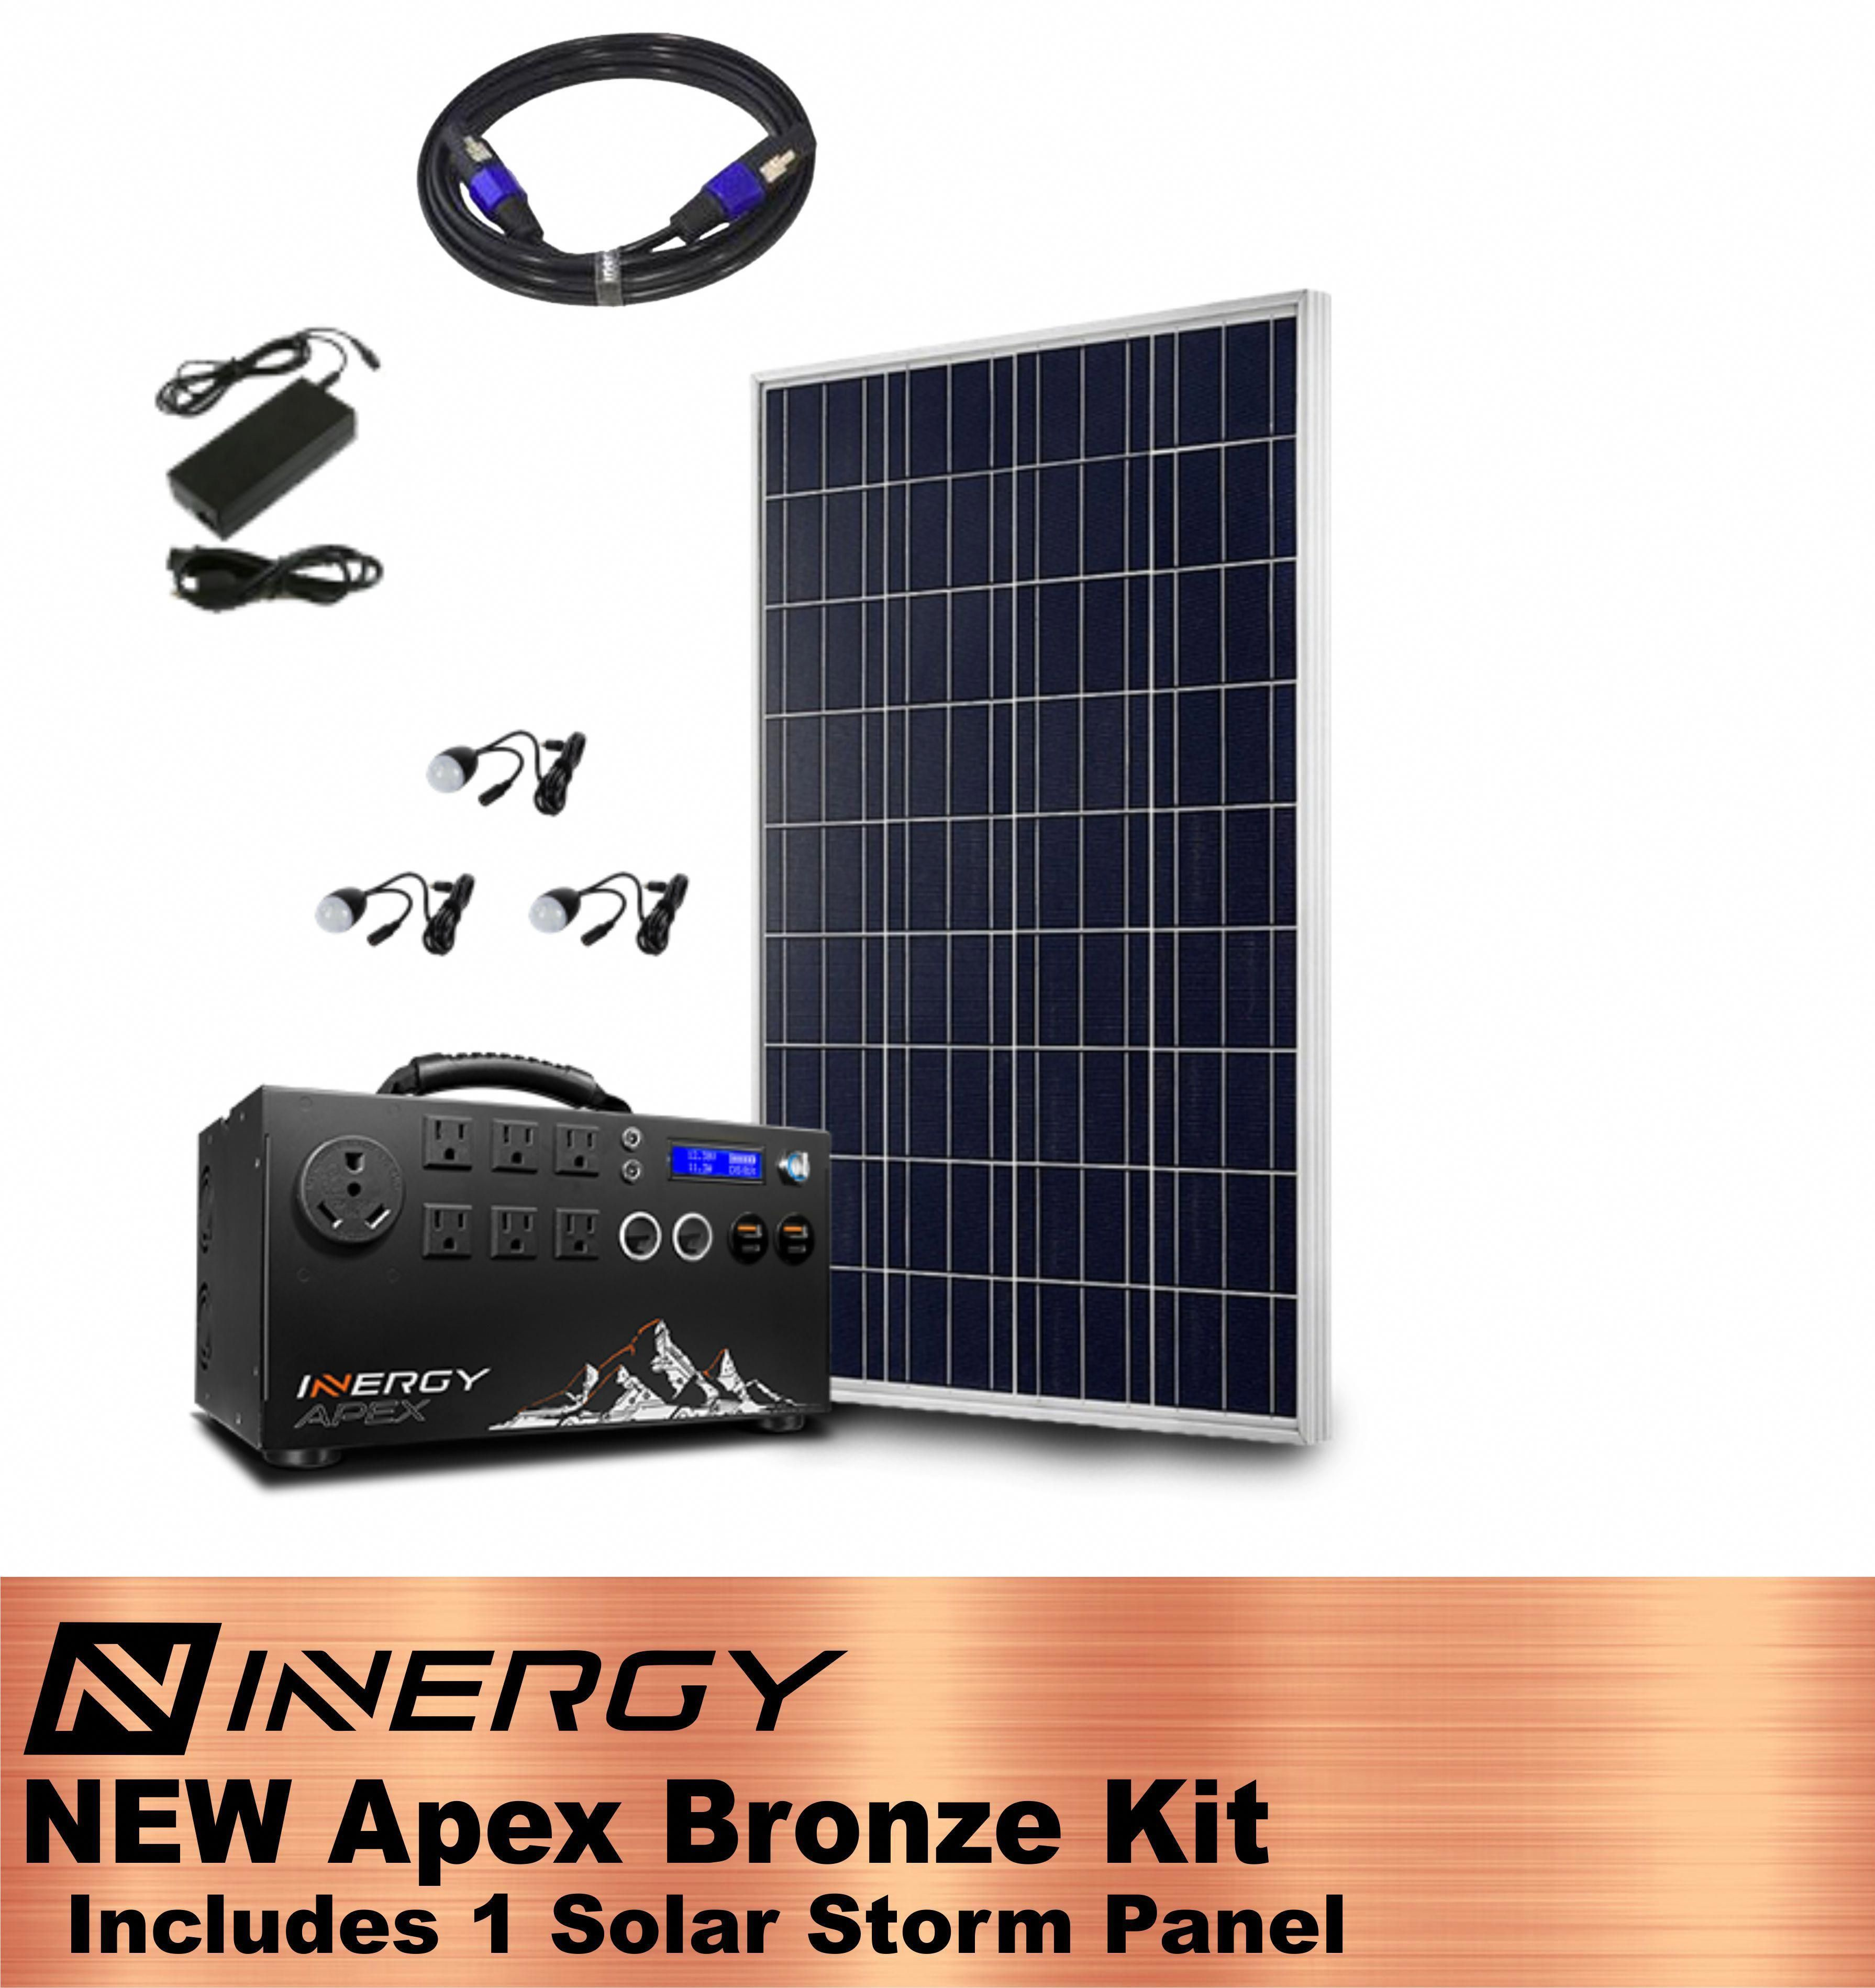 Inergy Apex Solar Generator Bronze Kit With 1 Solar Storm Panel Solar Generator Solar Panels Best Solar Panels